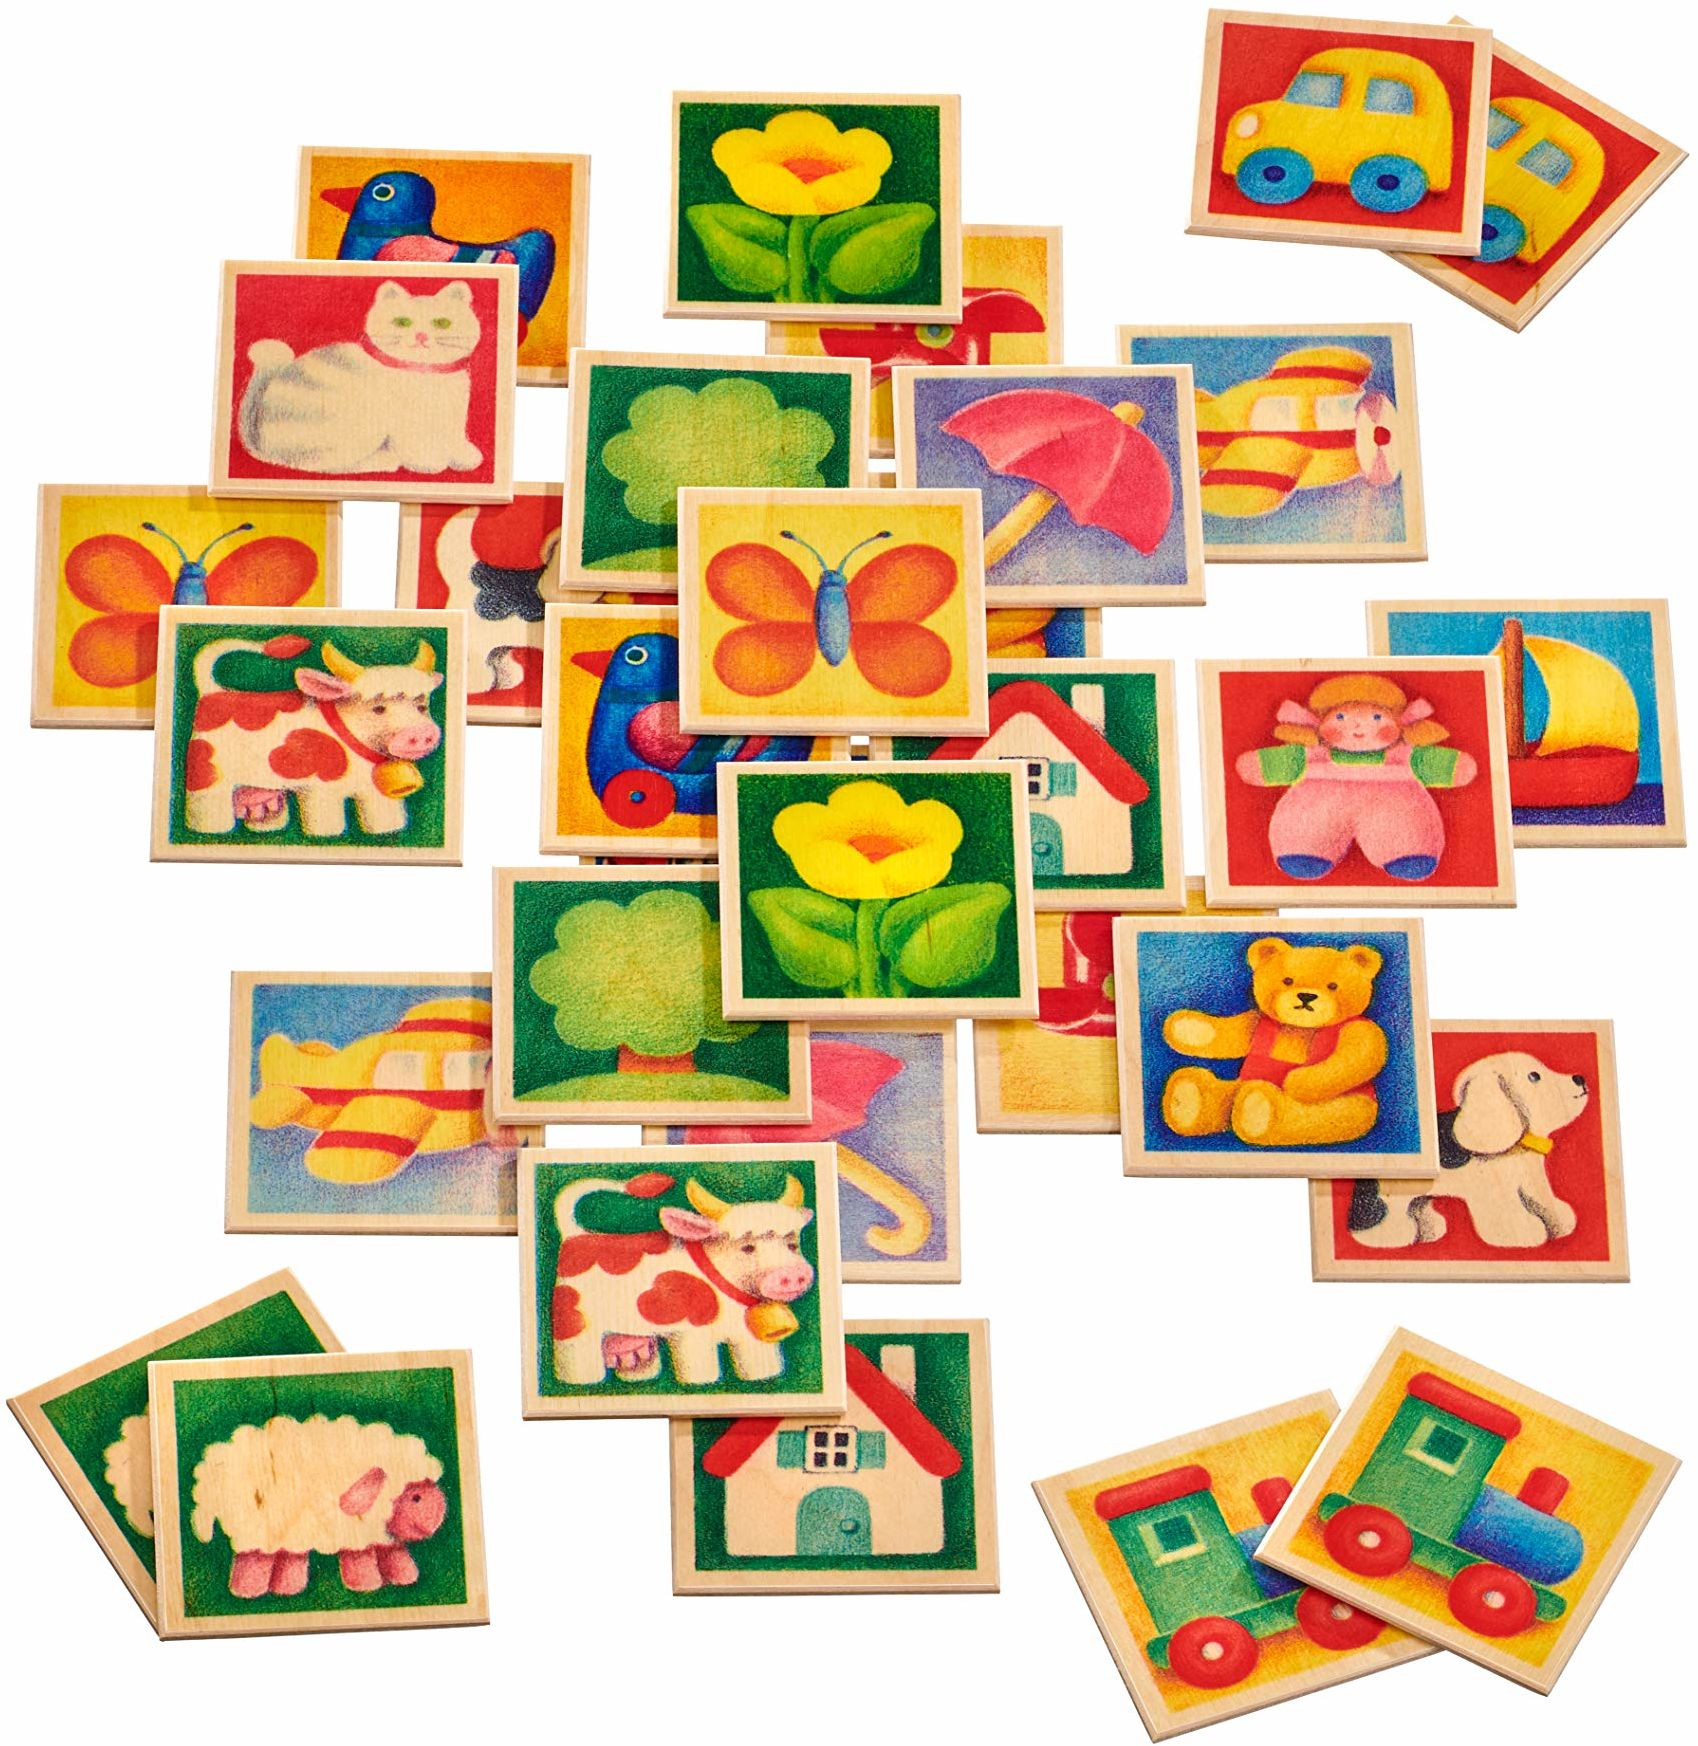 Selecta 63017 Memo Kunterbunt, loteryjka obrazkowa, 36 części